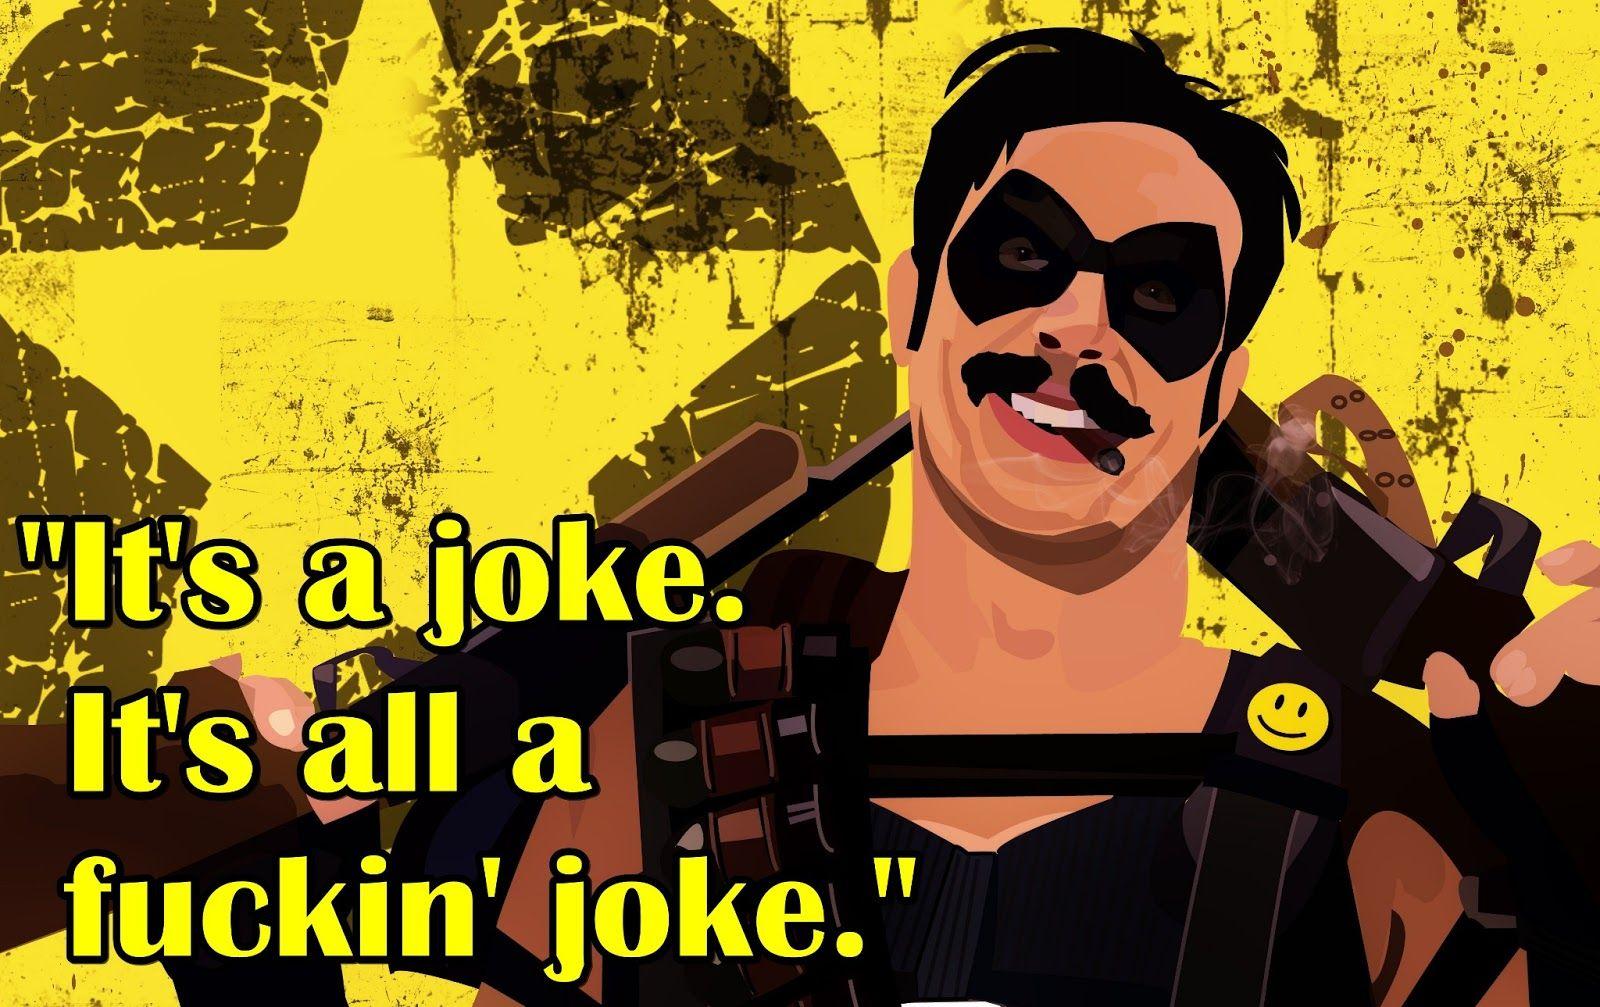 Watchmen 2009 Cómics Frases Y Tatuajes